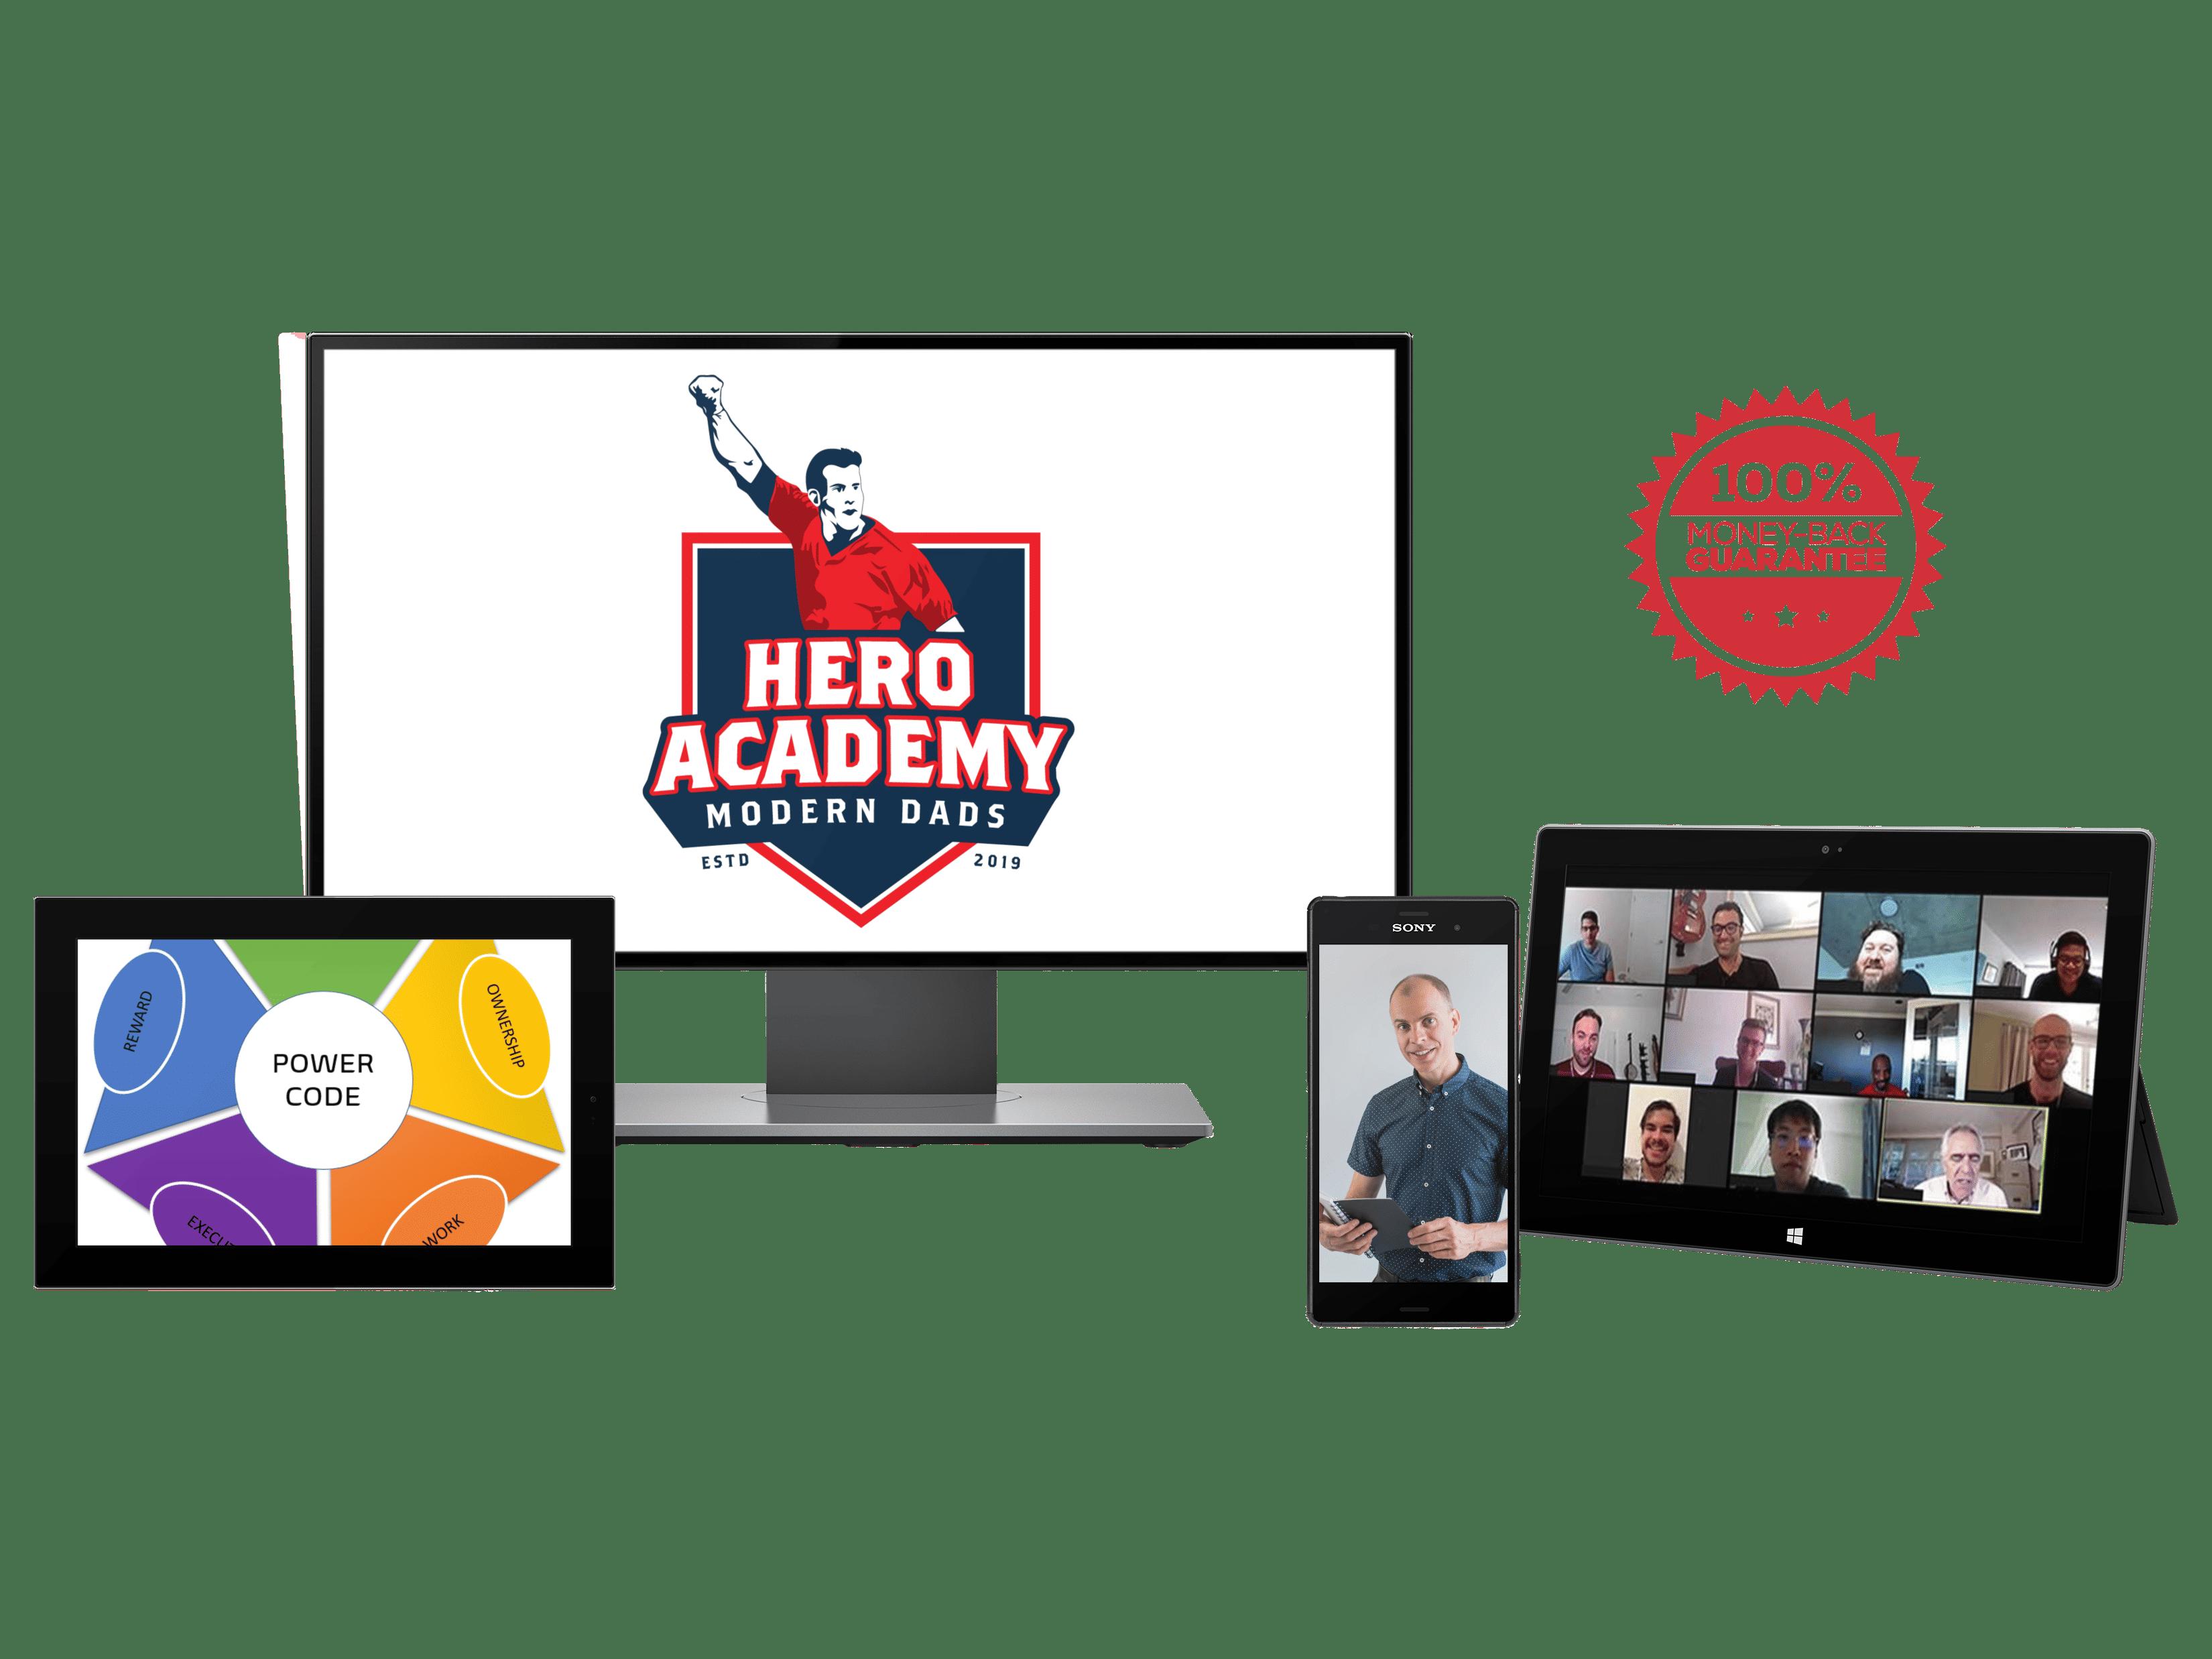 The Hero Academy programme